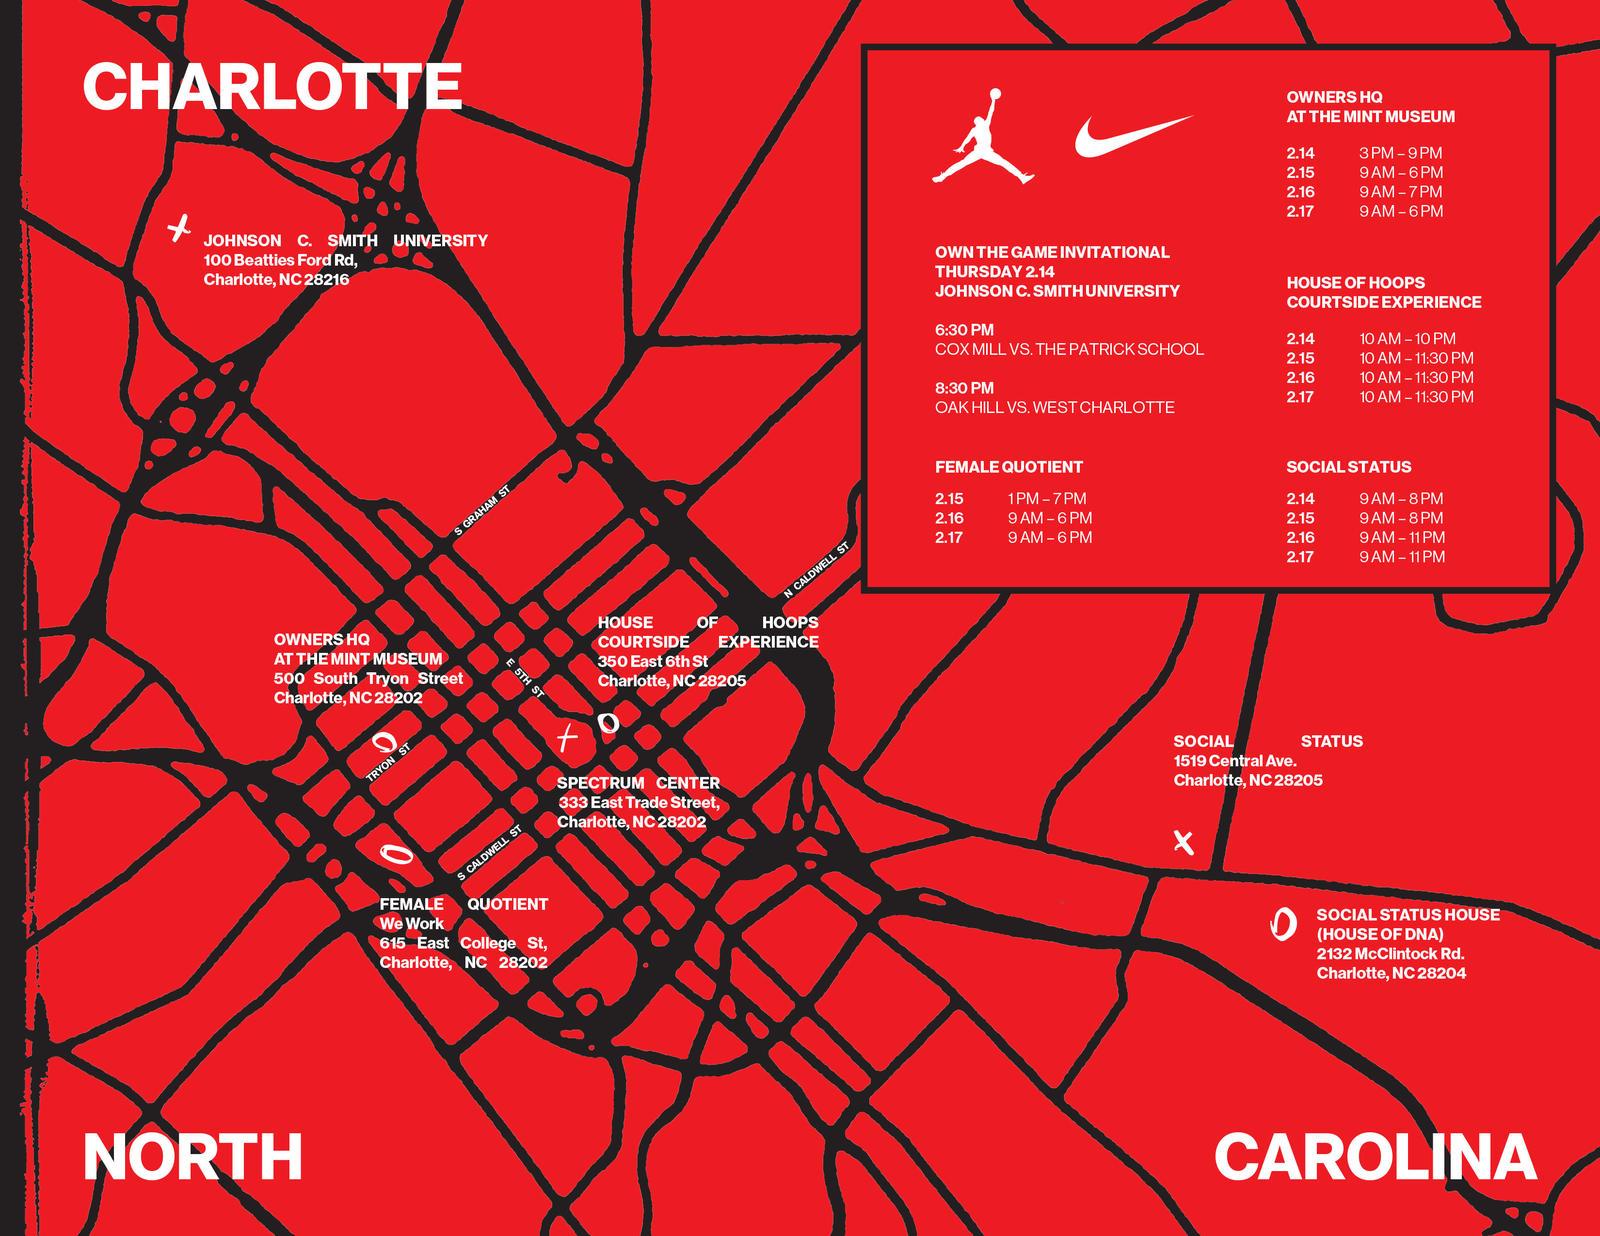 Nike Jordan Brand NBA All Star Weekend 2019, SNKRS Pop-Up